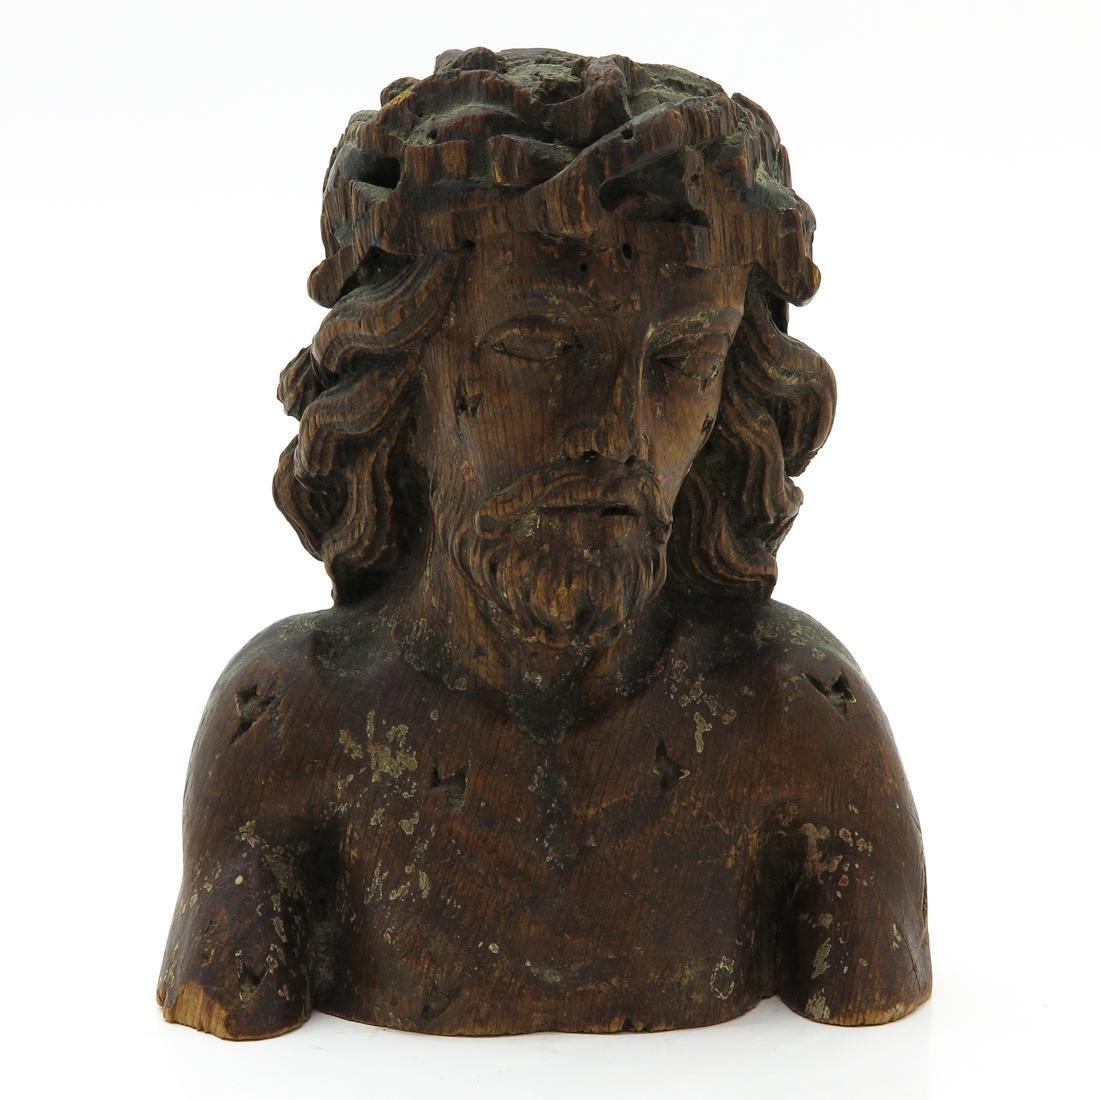 Wood Sculpture Depicting Bust of Christ Circa 1800